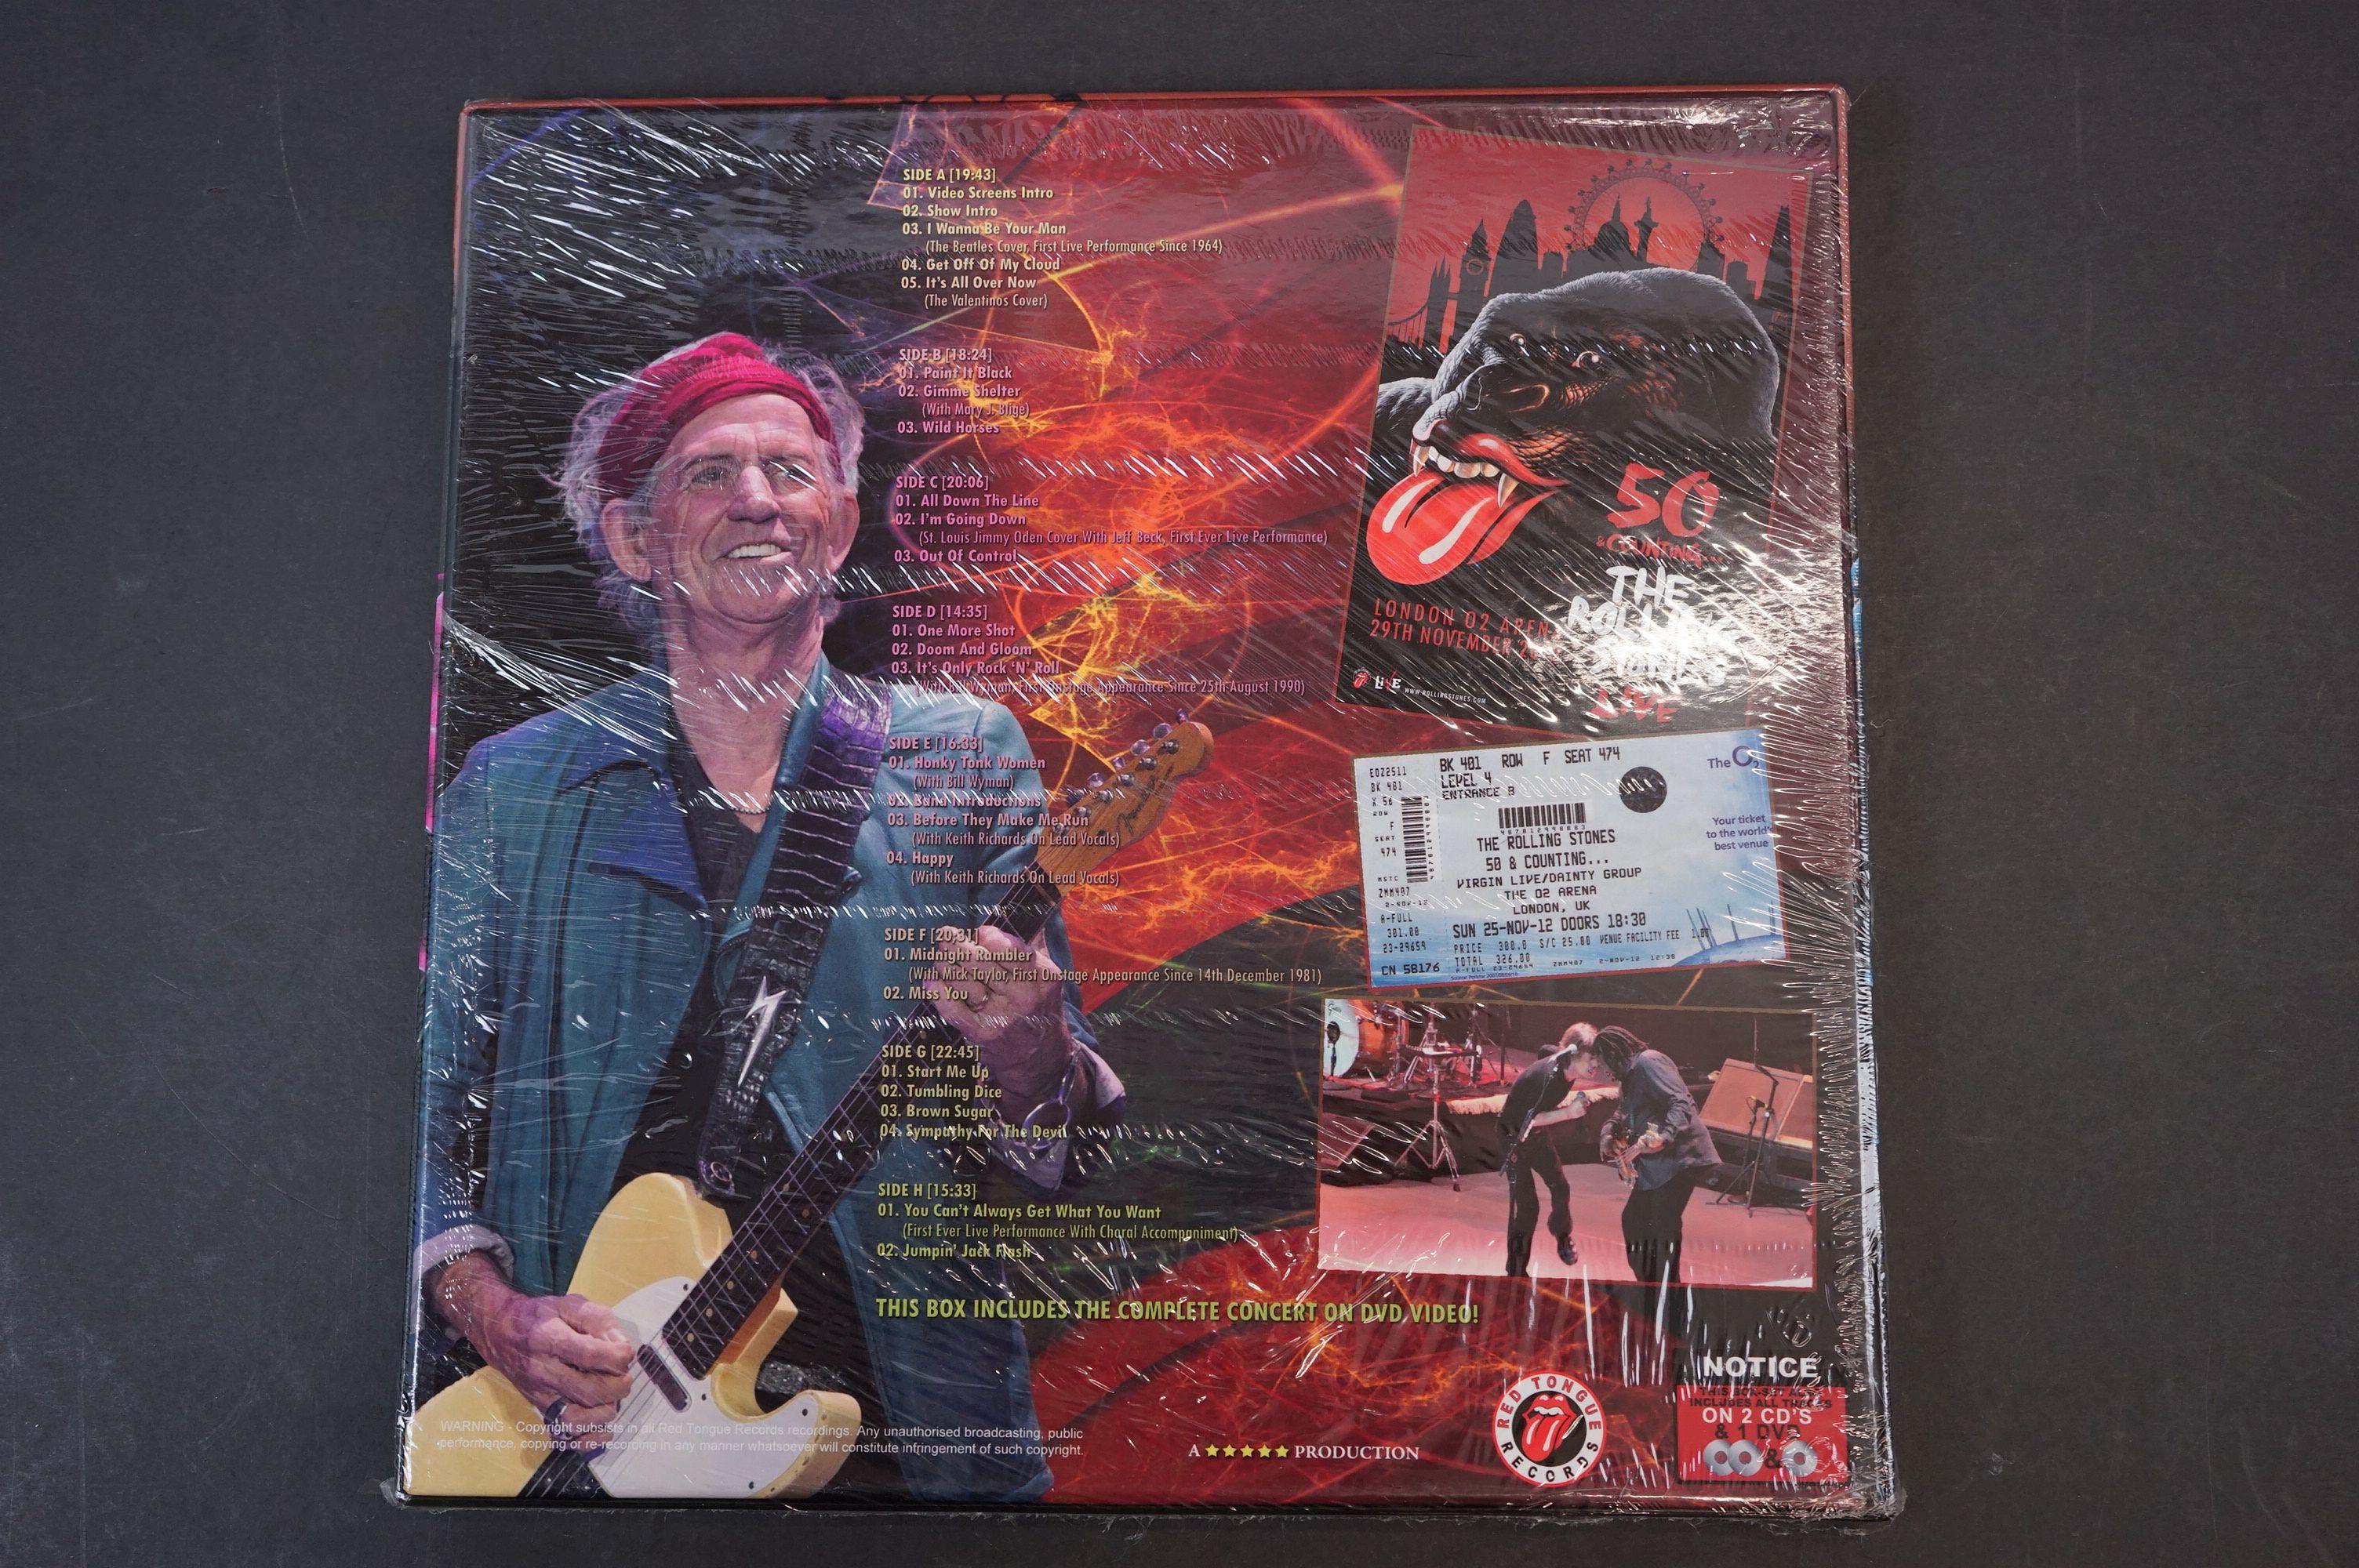 Vinyl - ltd edn The Rolling Stones London 02 Arena 4 LP / 2 CD / 1 DVD Box Set RTR028, heavy - Image 2 of 2